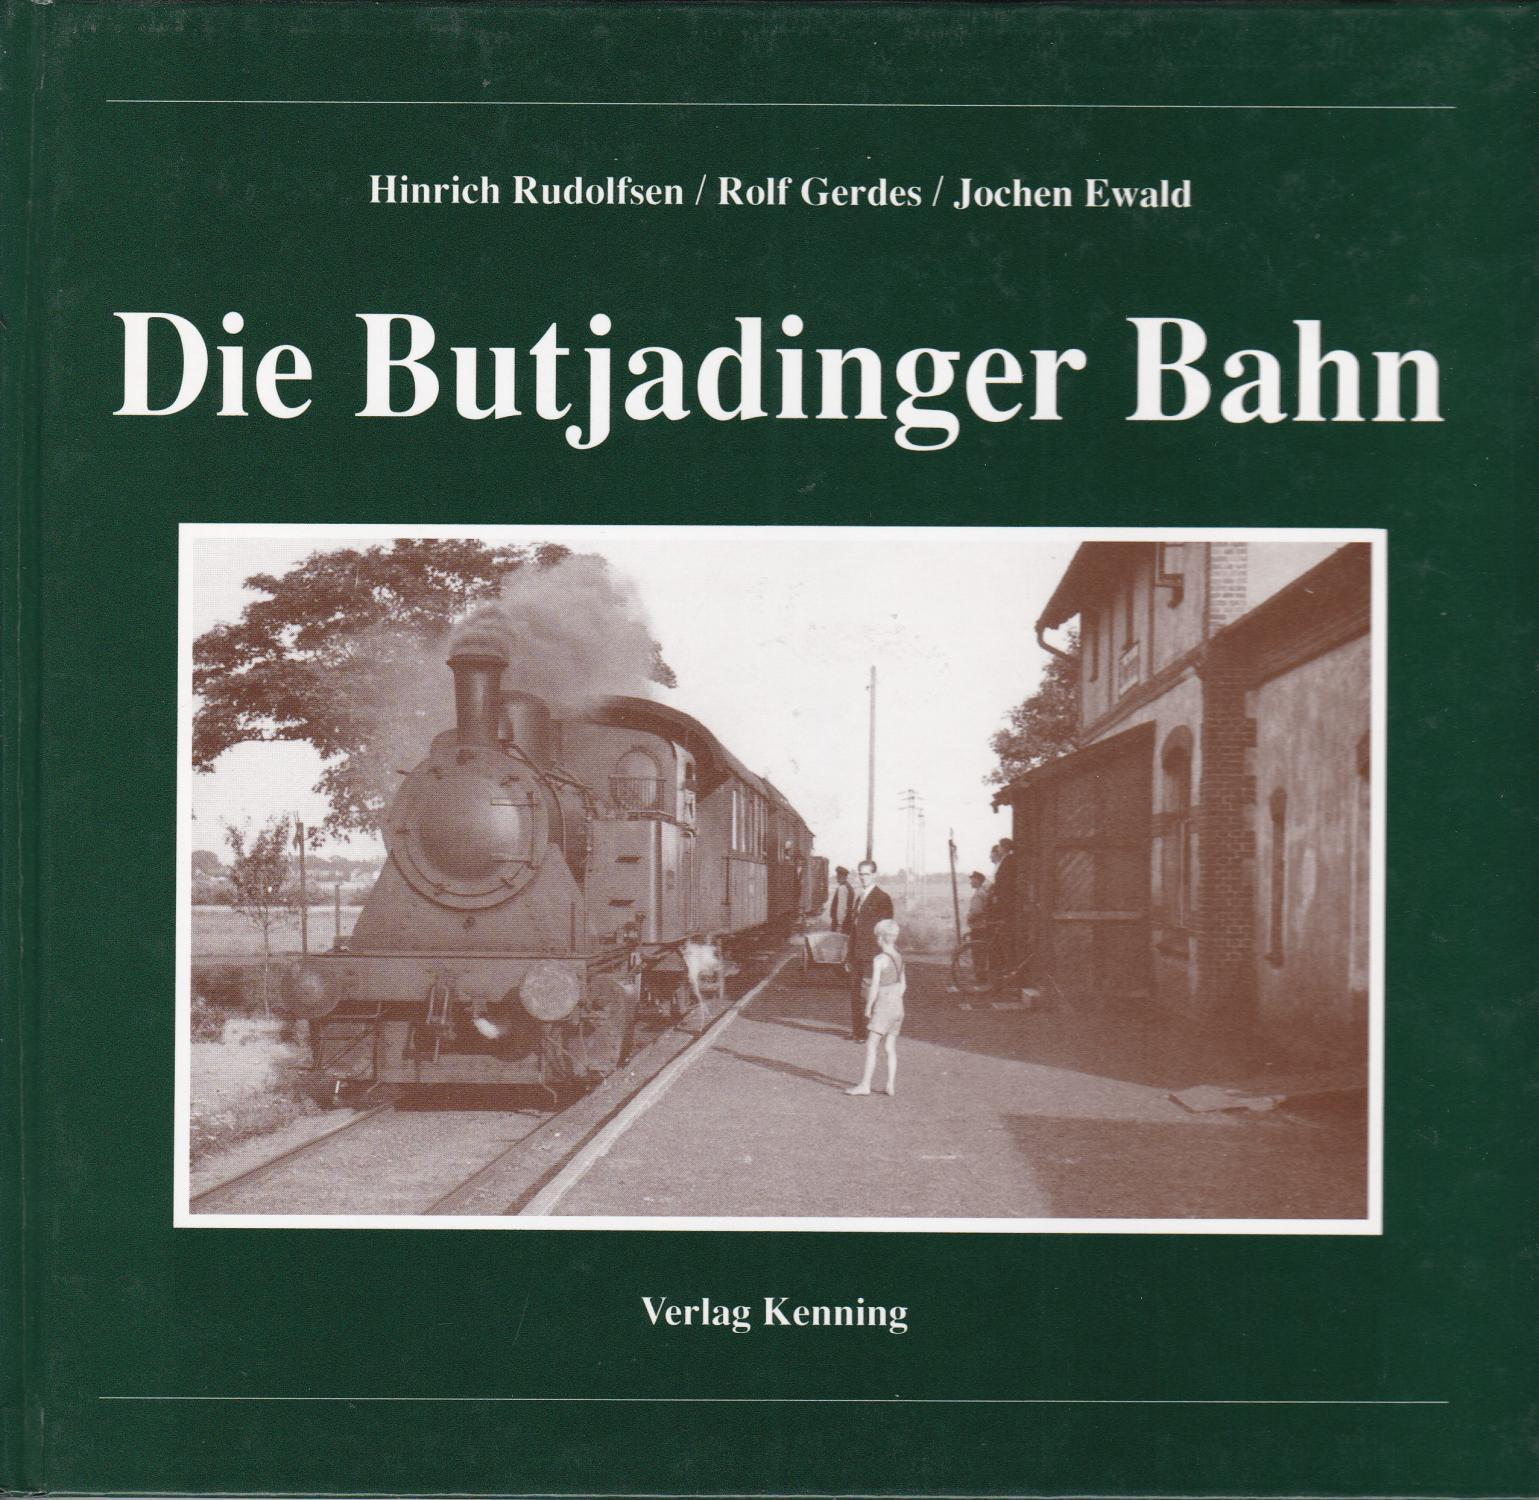 Die Butjadinger Bahn